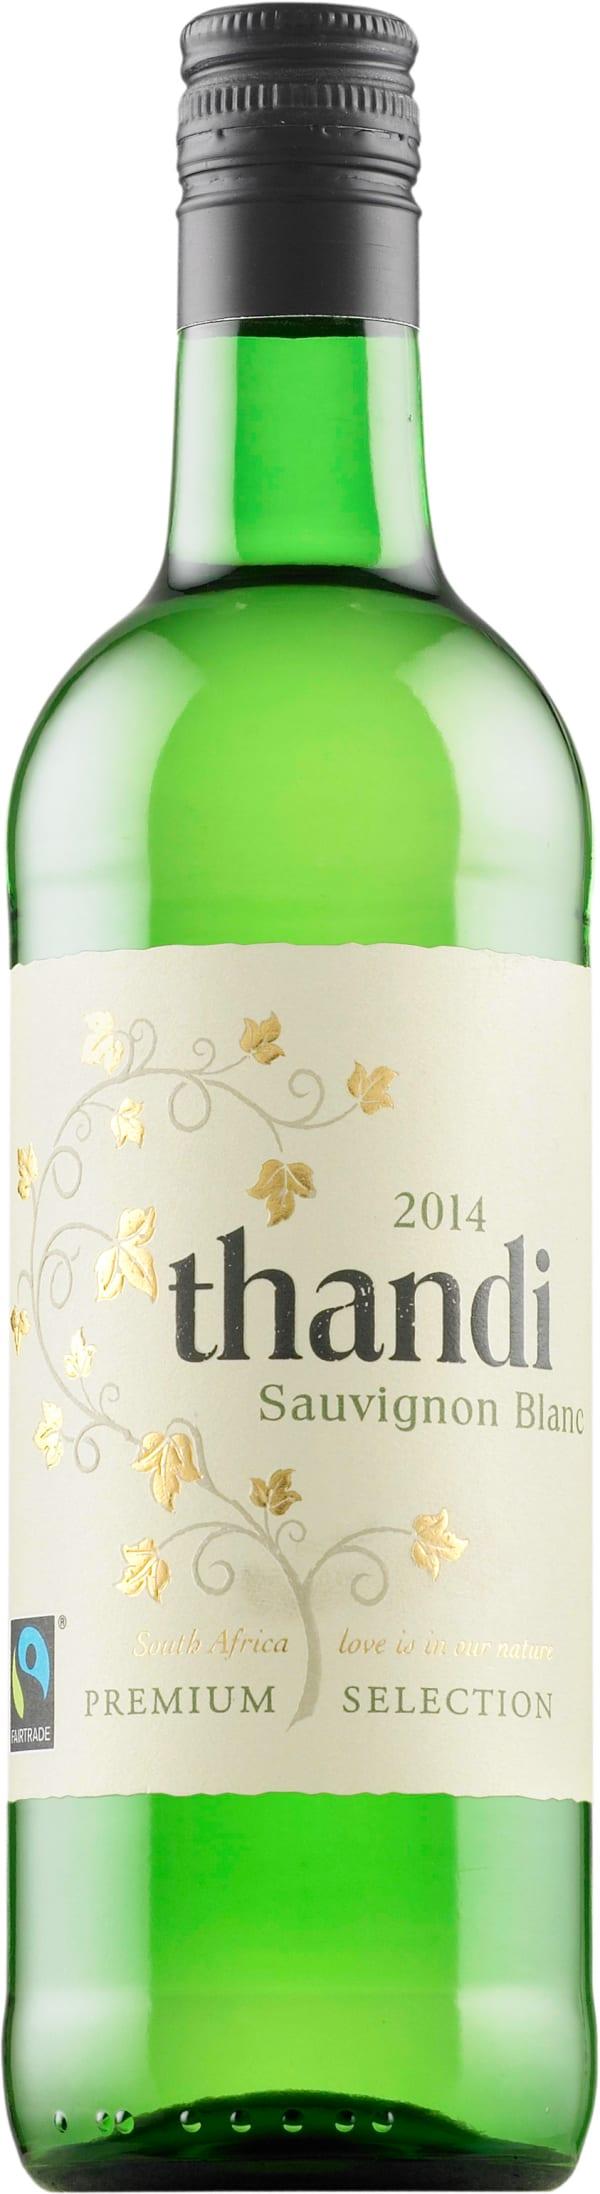 Thandi Sauvignon Blanc 2017